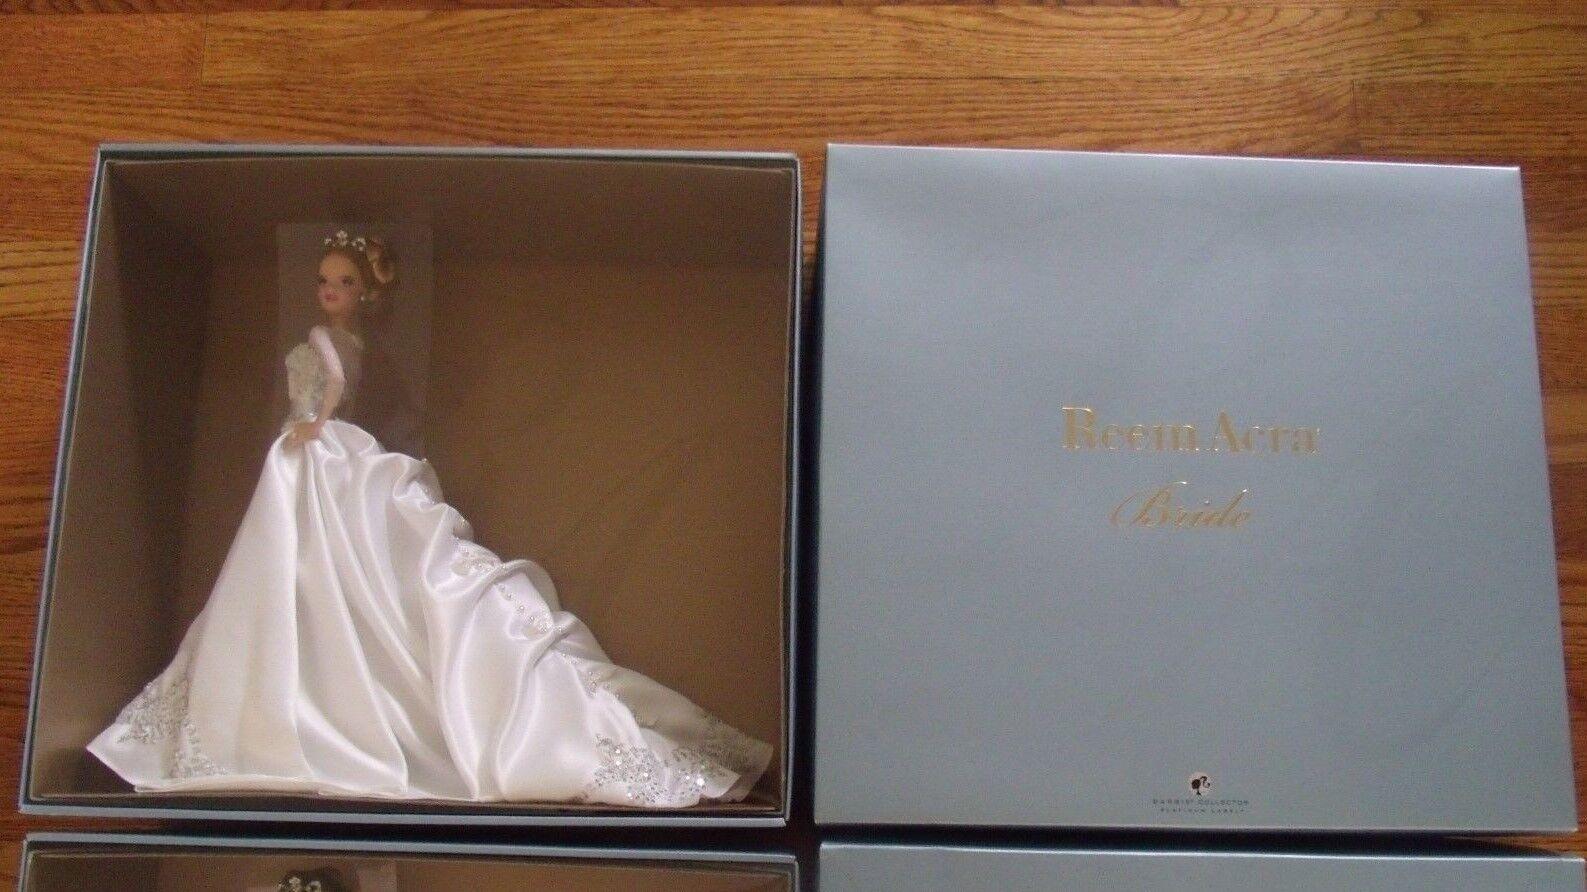 Reem Acra Barbie Rubia Platinum Label Silkstone Moda Modelo 2007 Rara